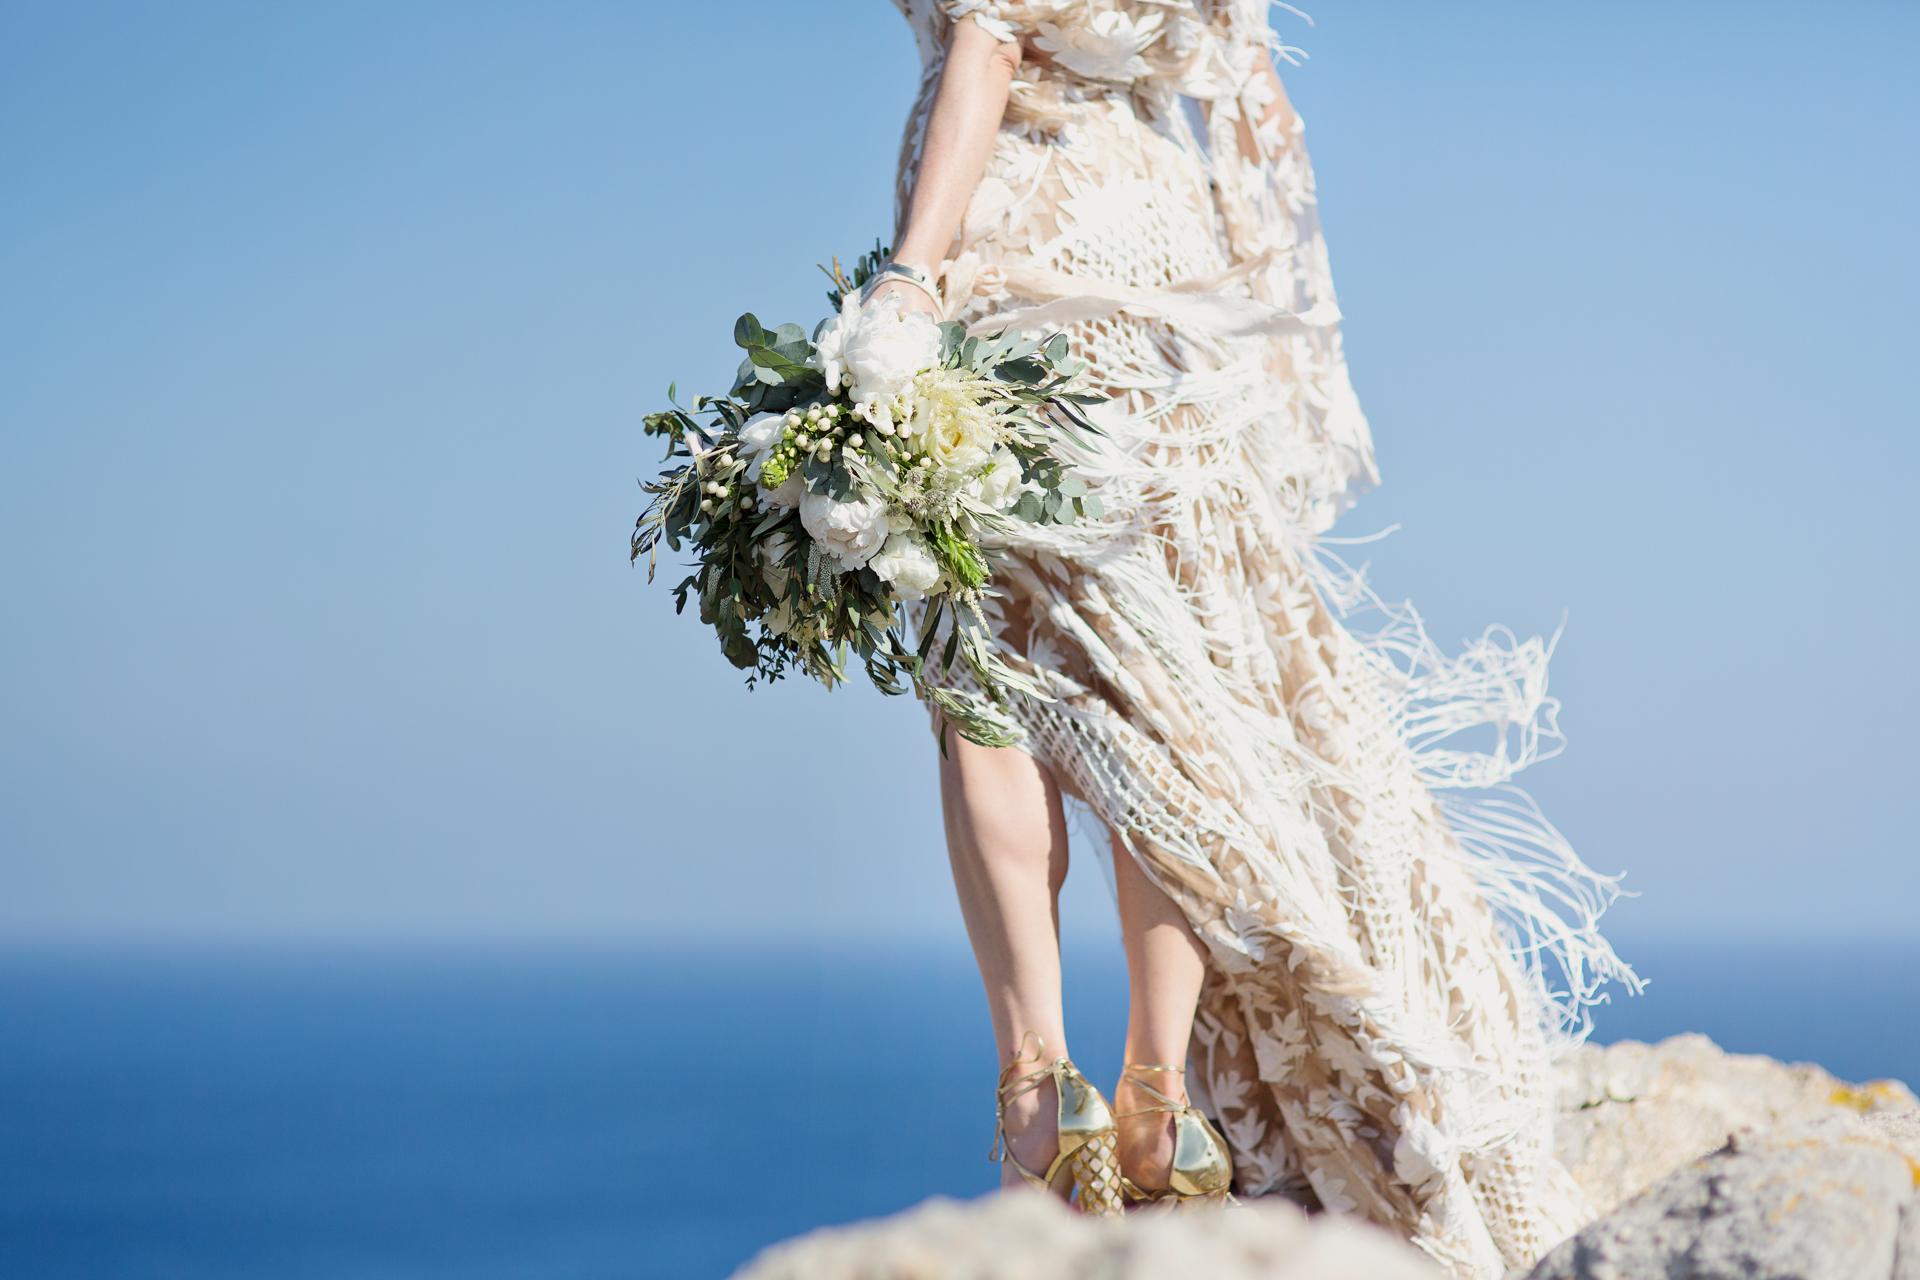 rue de seine bridal gown in the wind on a cliff top in mykonos